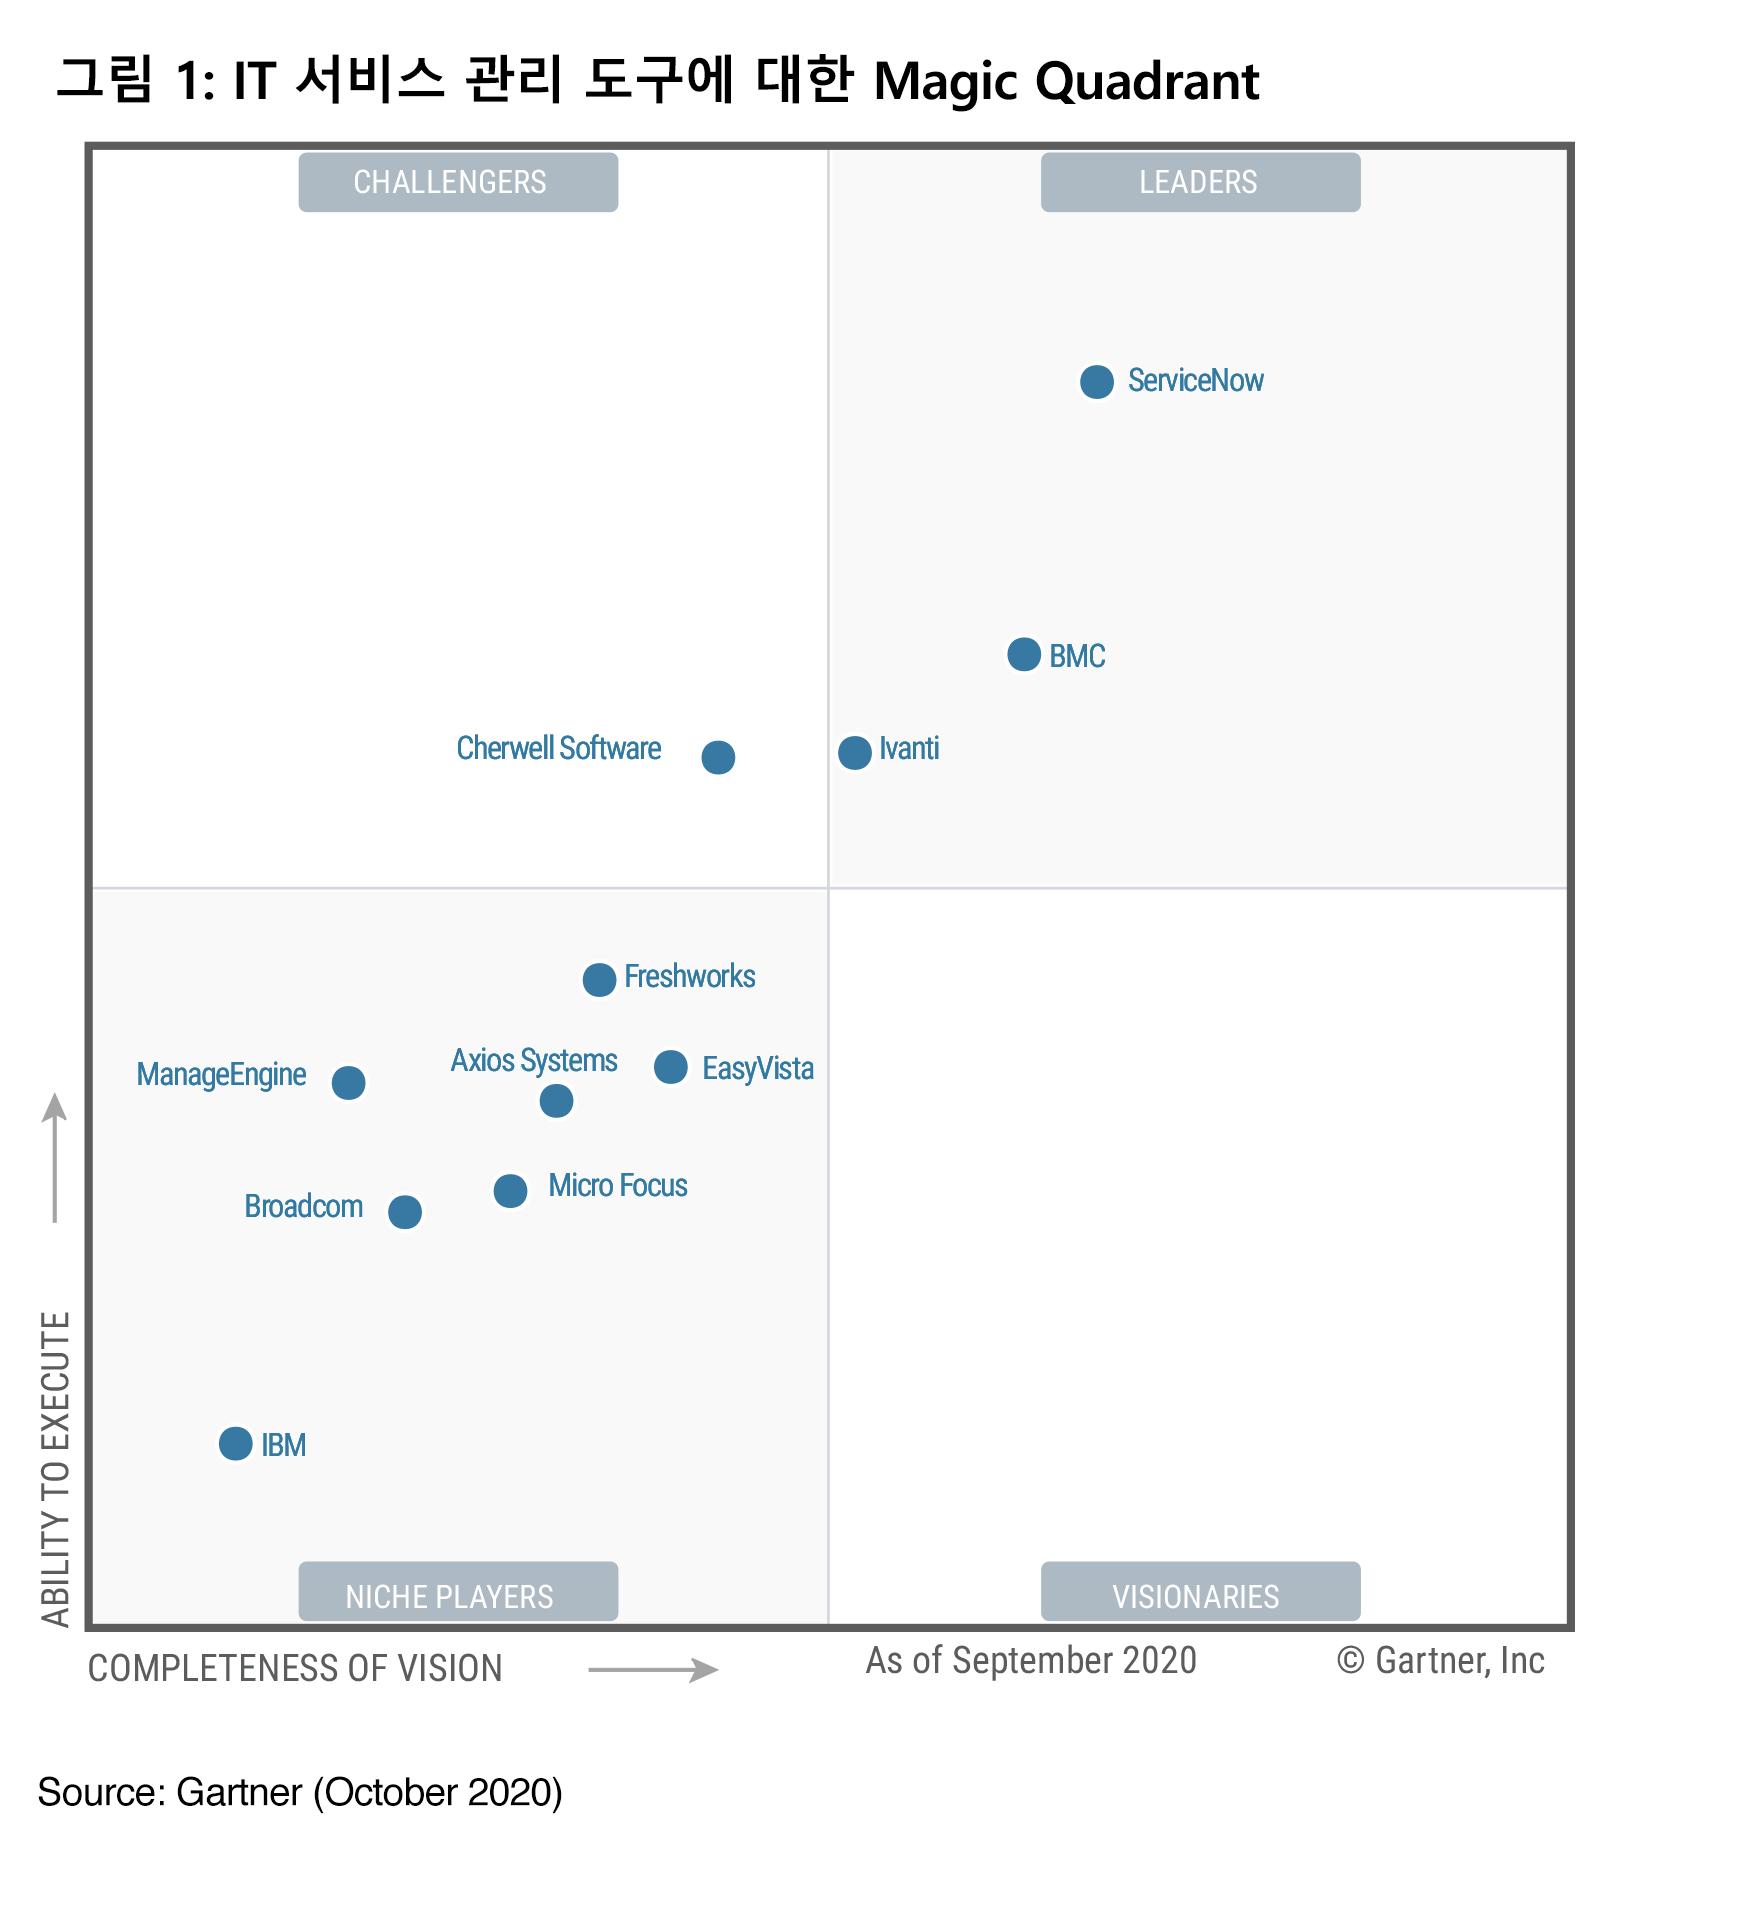 IT 서비스 관리 도구에 대한 2020 Gartner Magic Quadrant에 선정되었습니다